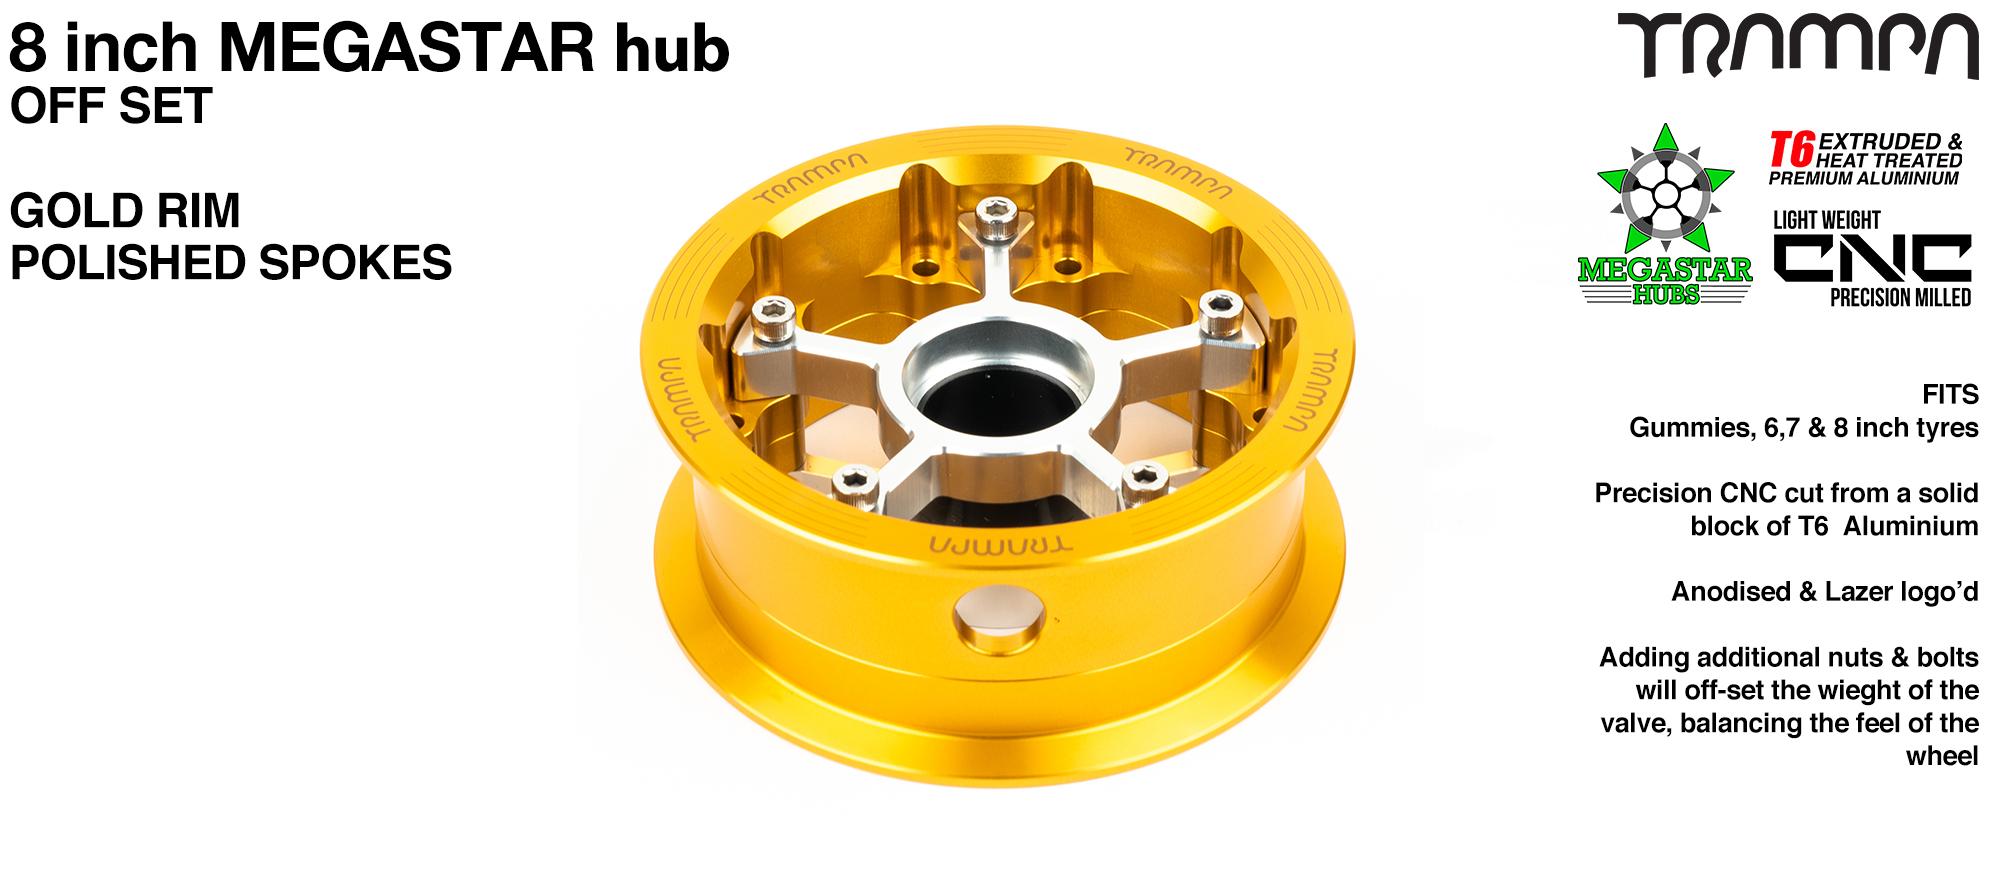 8 Inch OFF-SET MEGASTAR Hub - GOLD Rim with SILVER Spokes